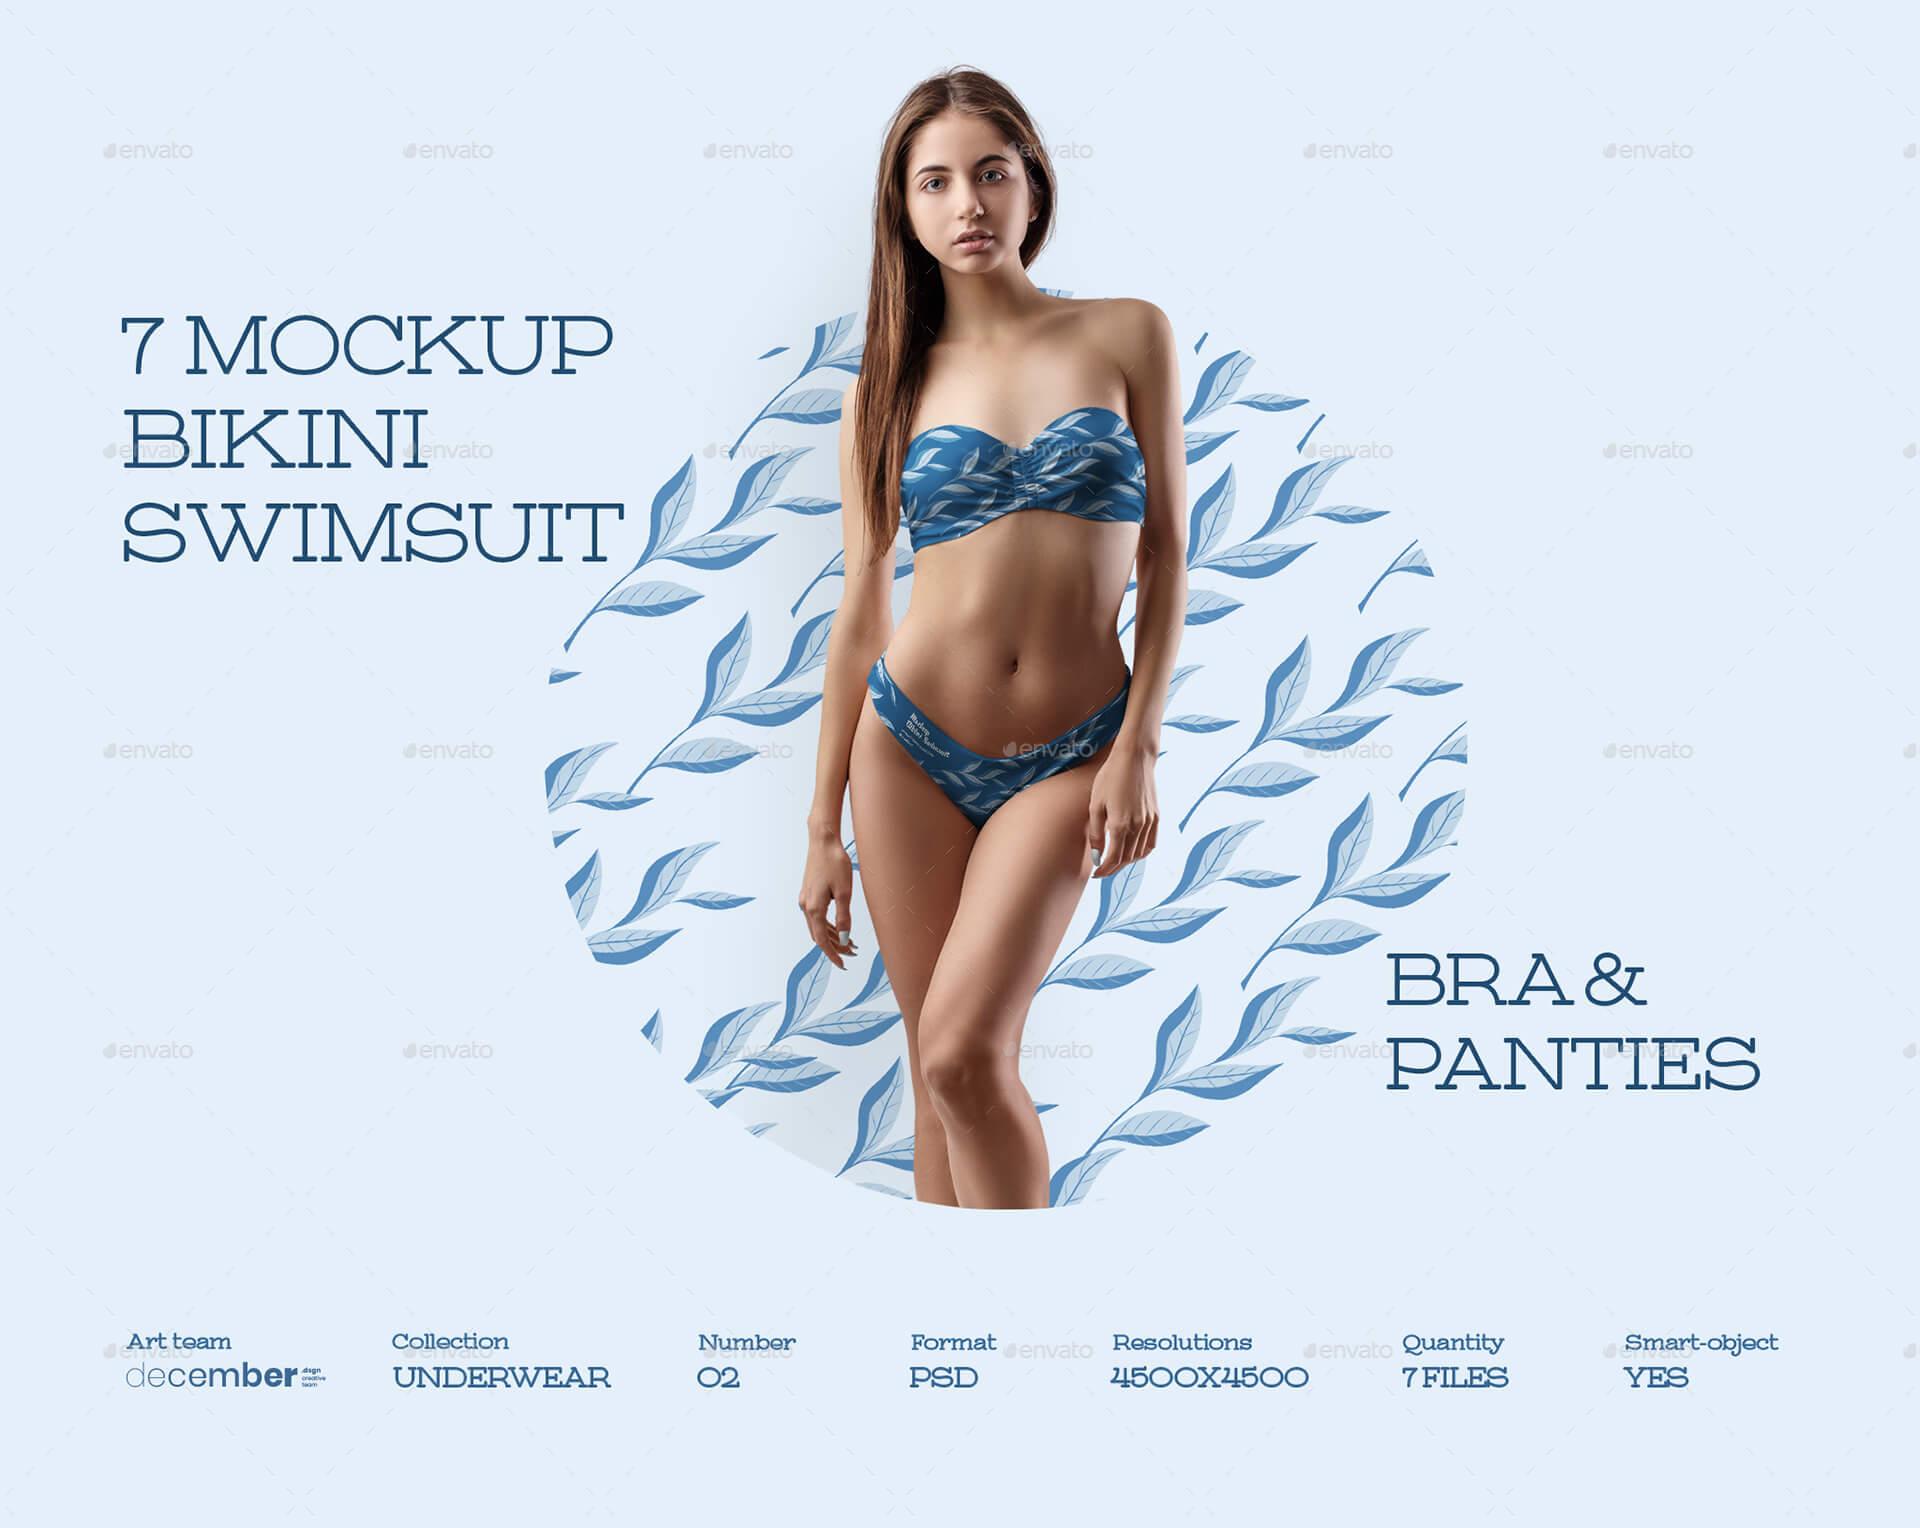 7 Mockups Bikini Swimsuit (1)